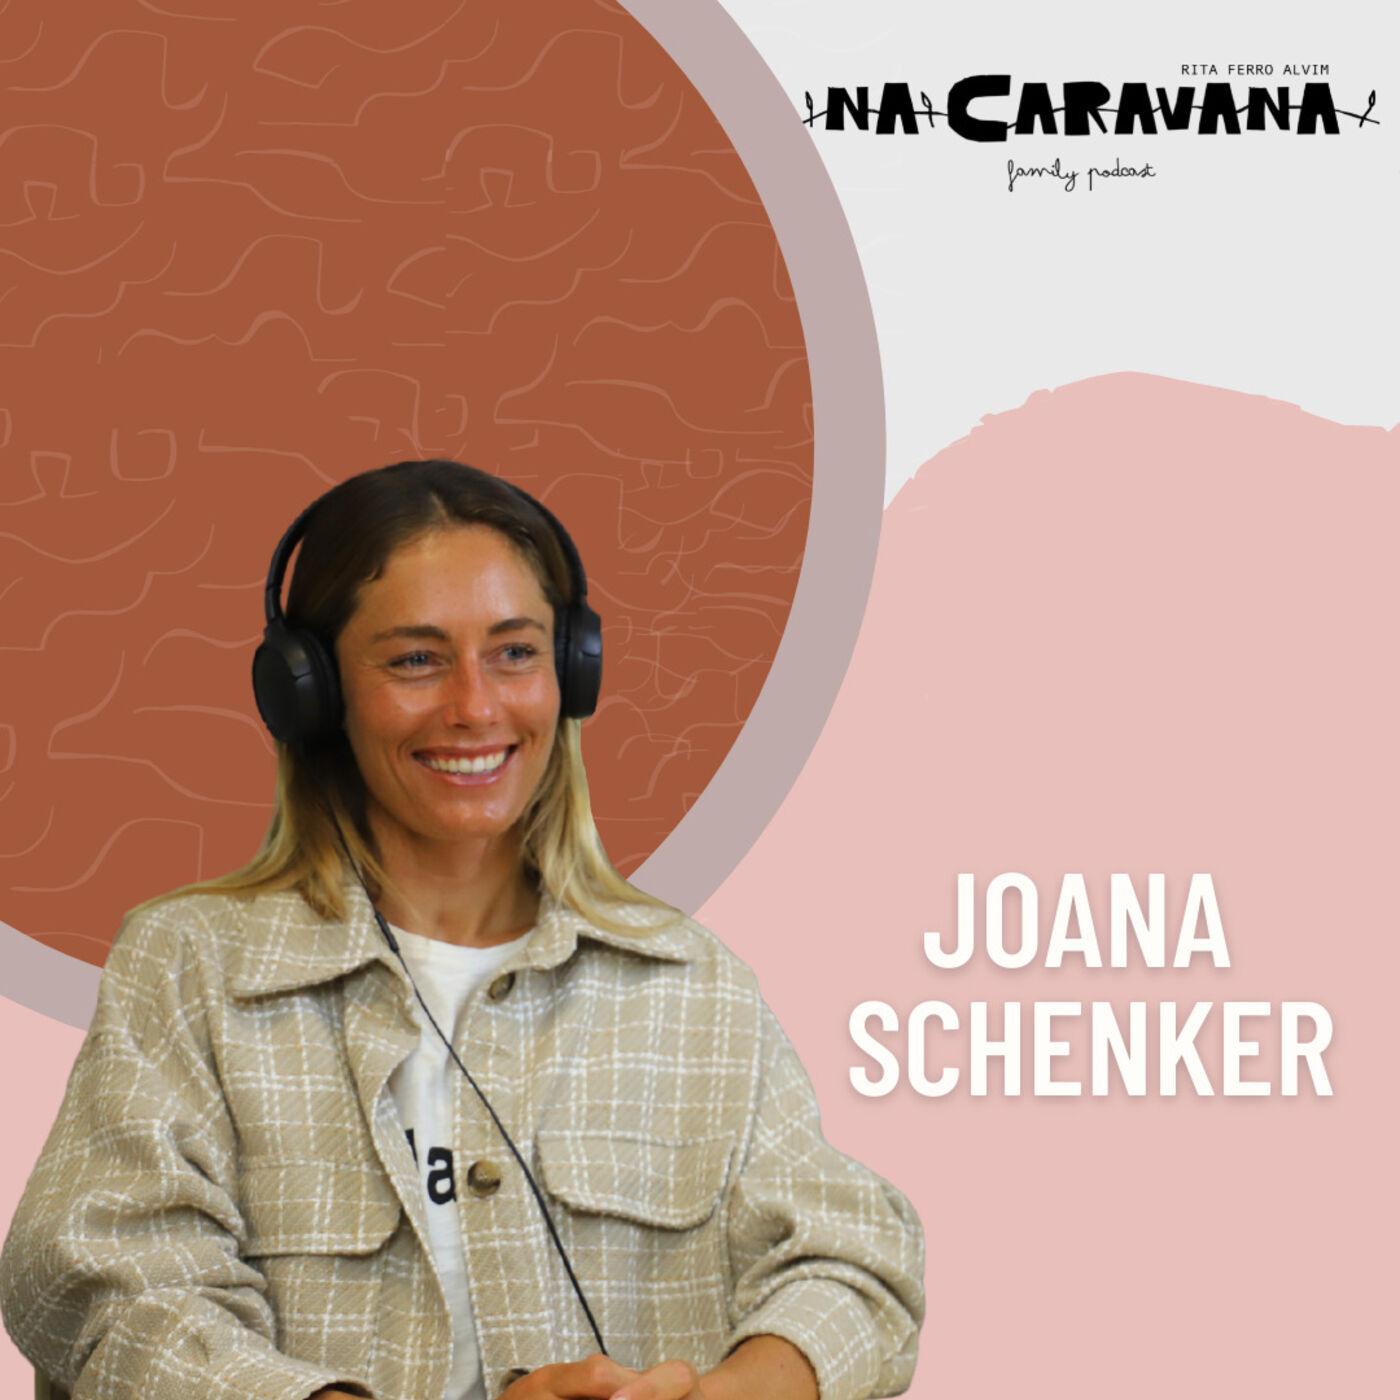 N'A Caravana com Joana Schenker #85 Viver ao sabor das ondas, Pedralva e GQ Portugal